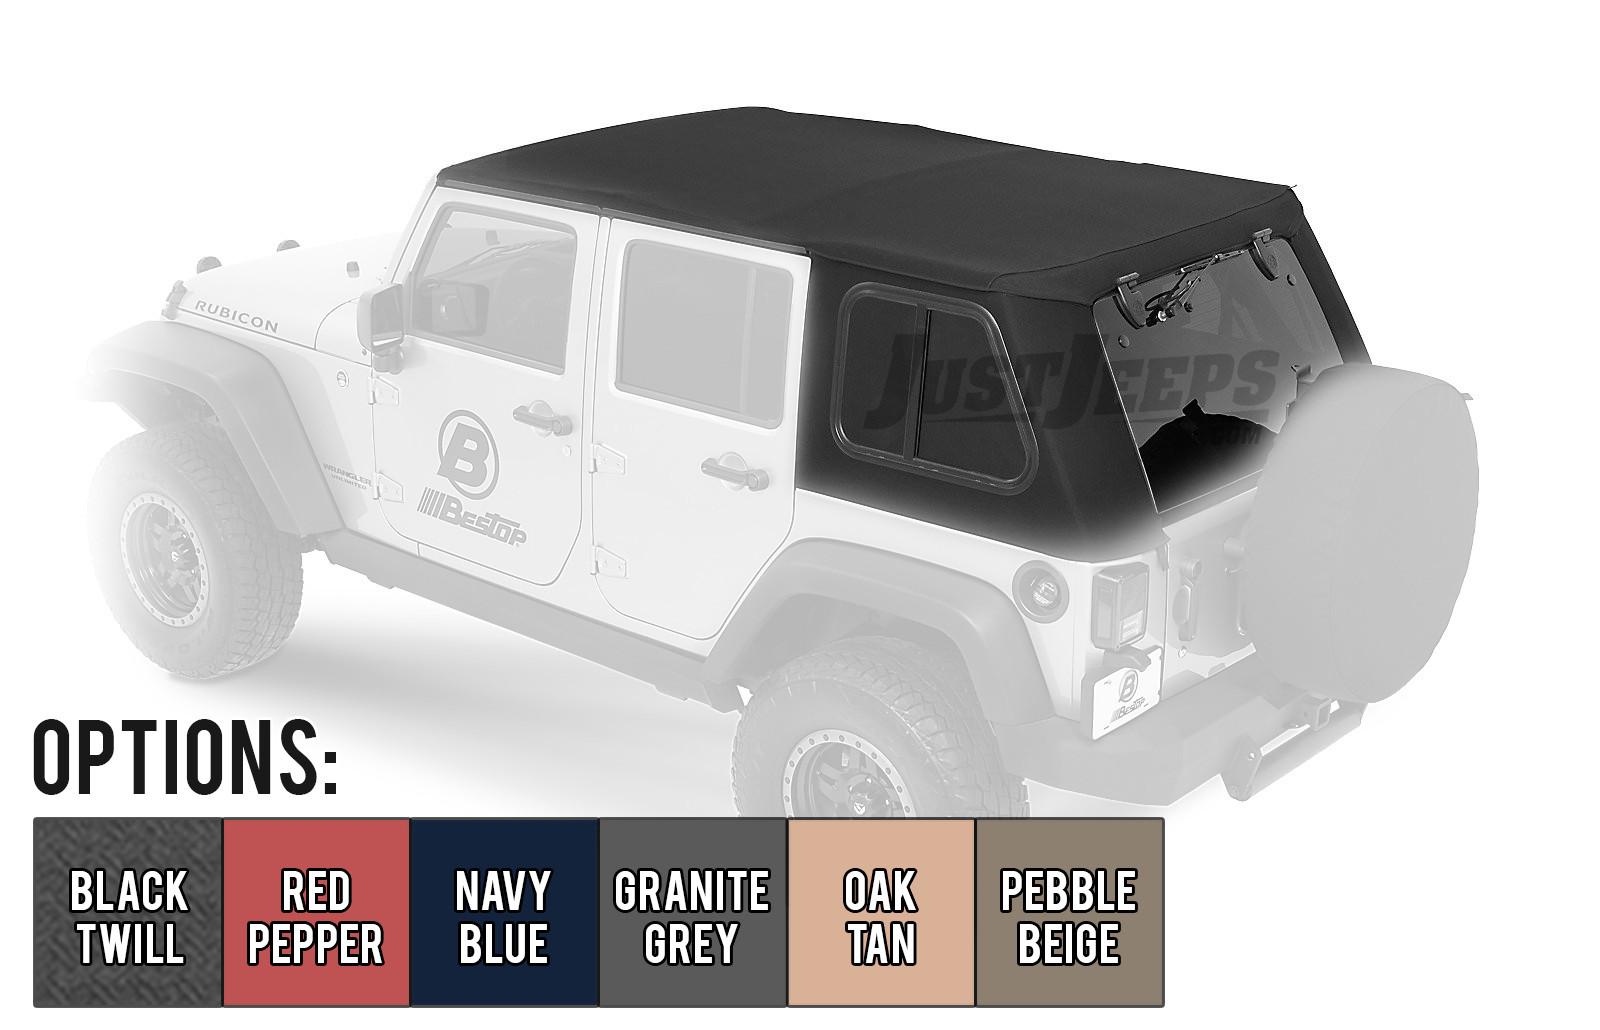 Bestop Trektop Pro Hybrid Soft Top With Tinted Removable Glass Windows For 2007-18 Jeep Wrangler JK Unlimited 4 Door Models